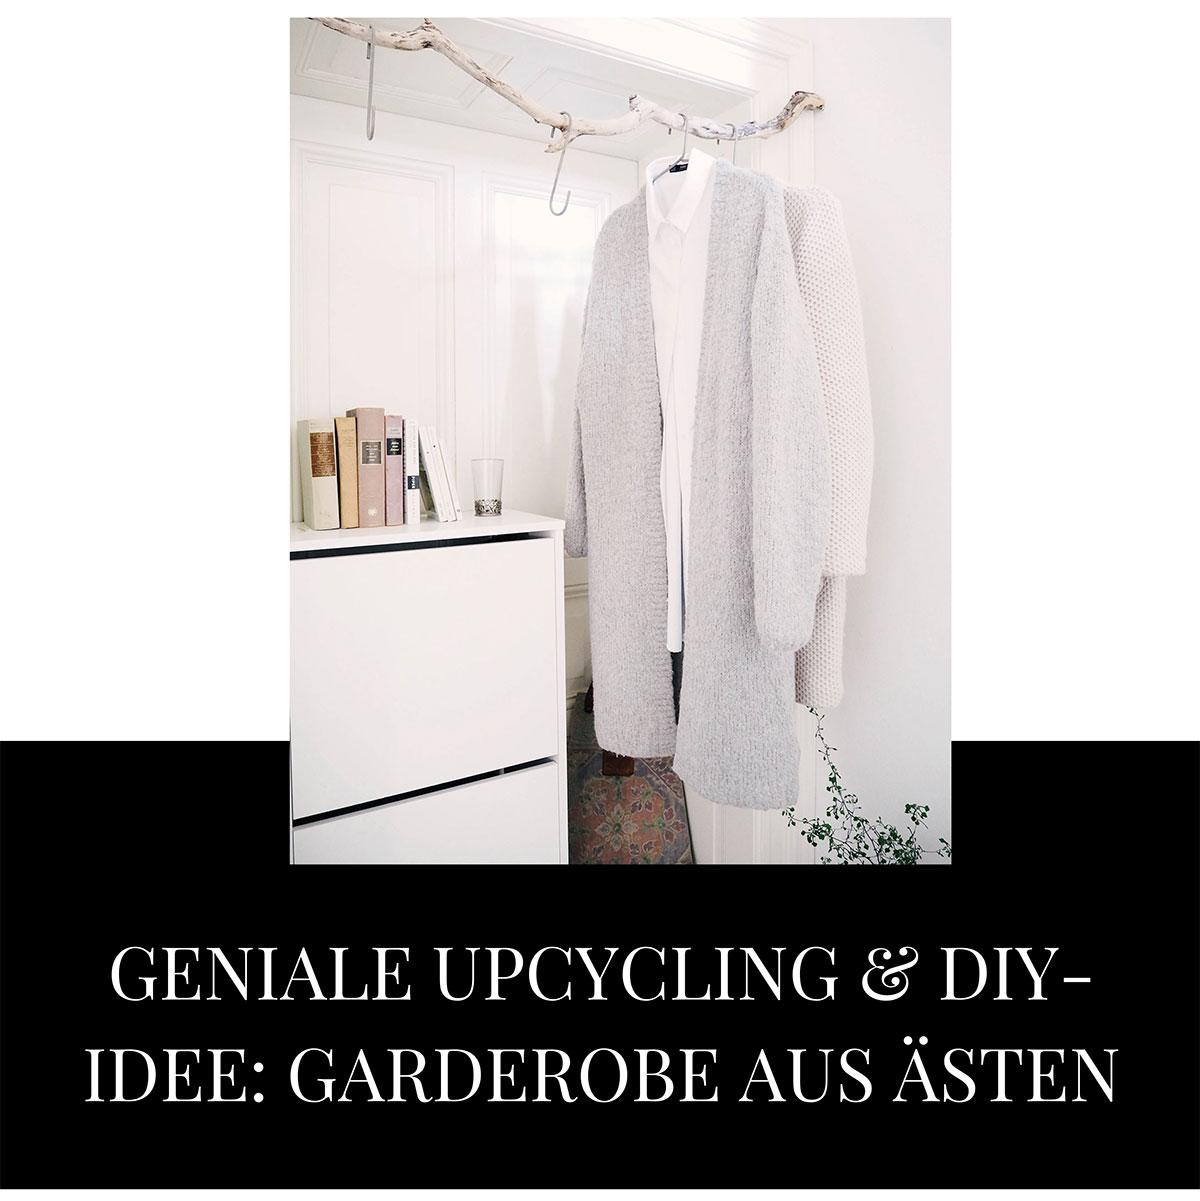 DIY Garderobe aus Ästen Lieblings Blog Wiesbaden